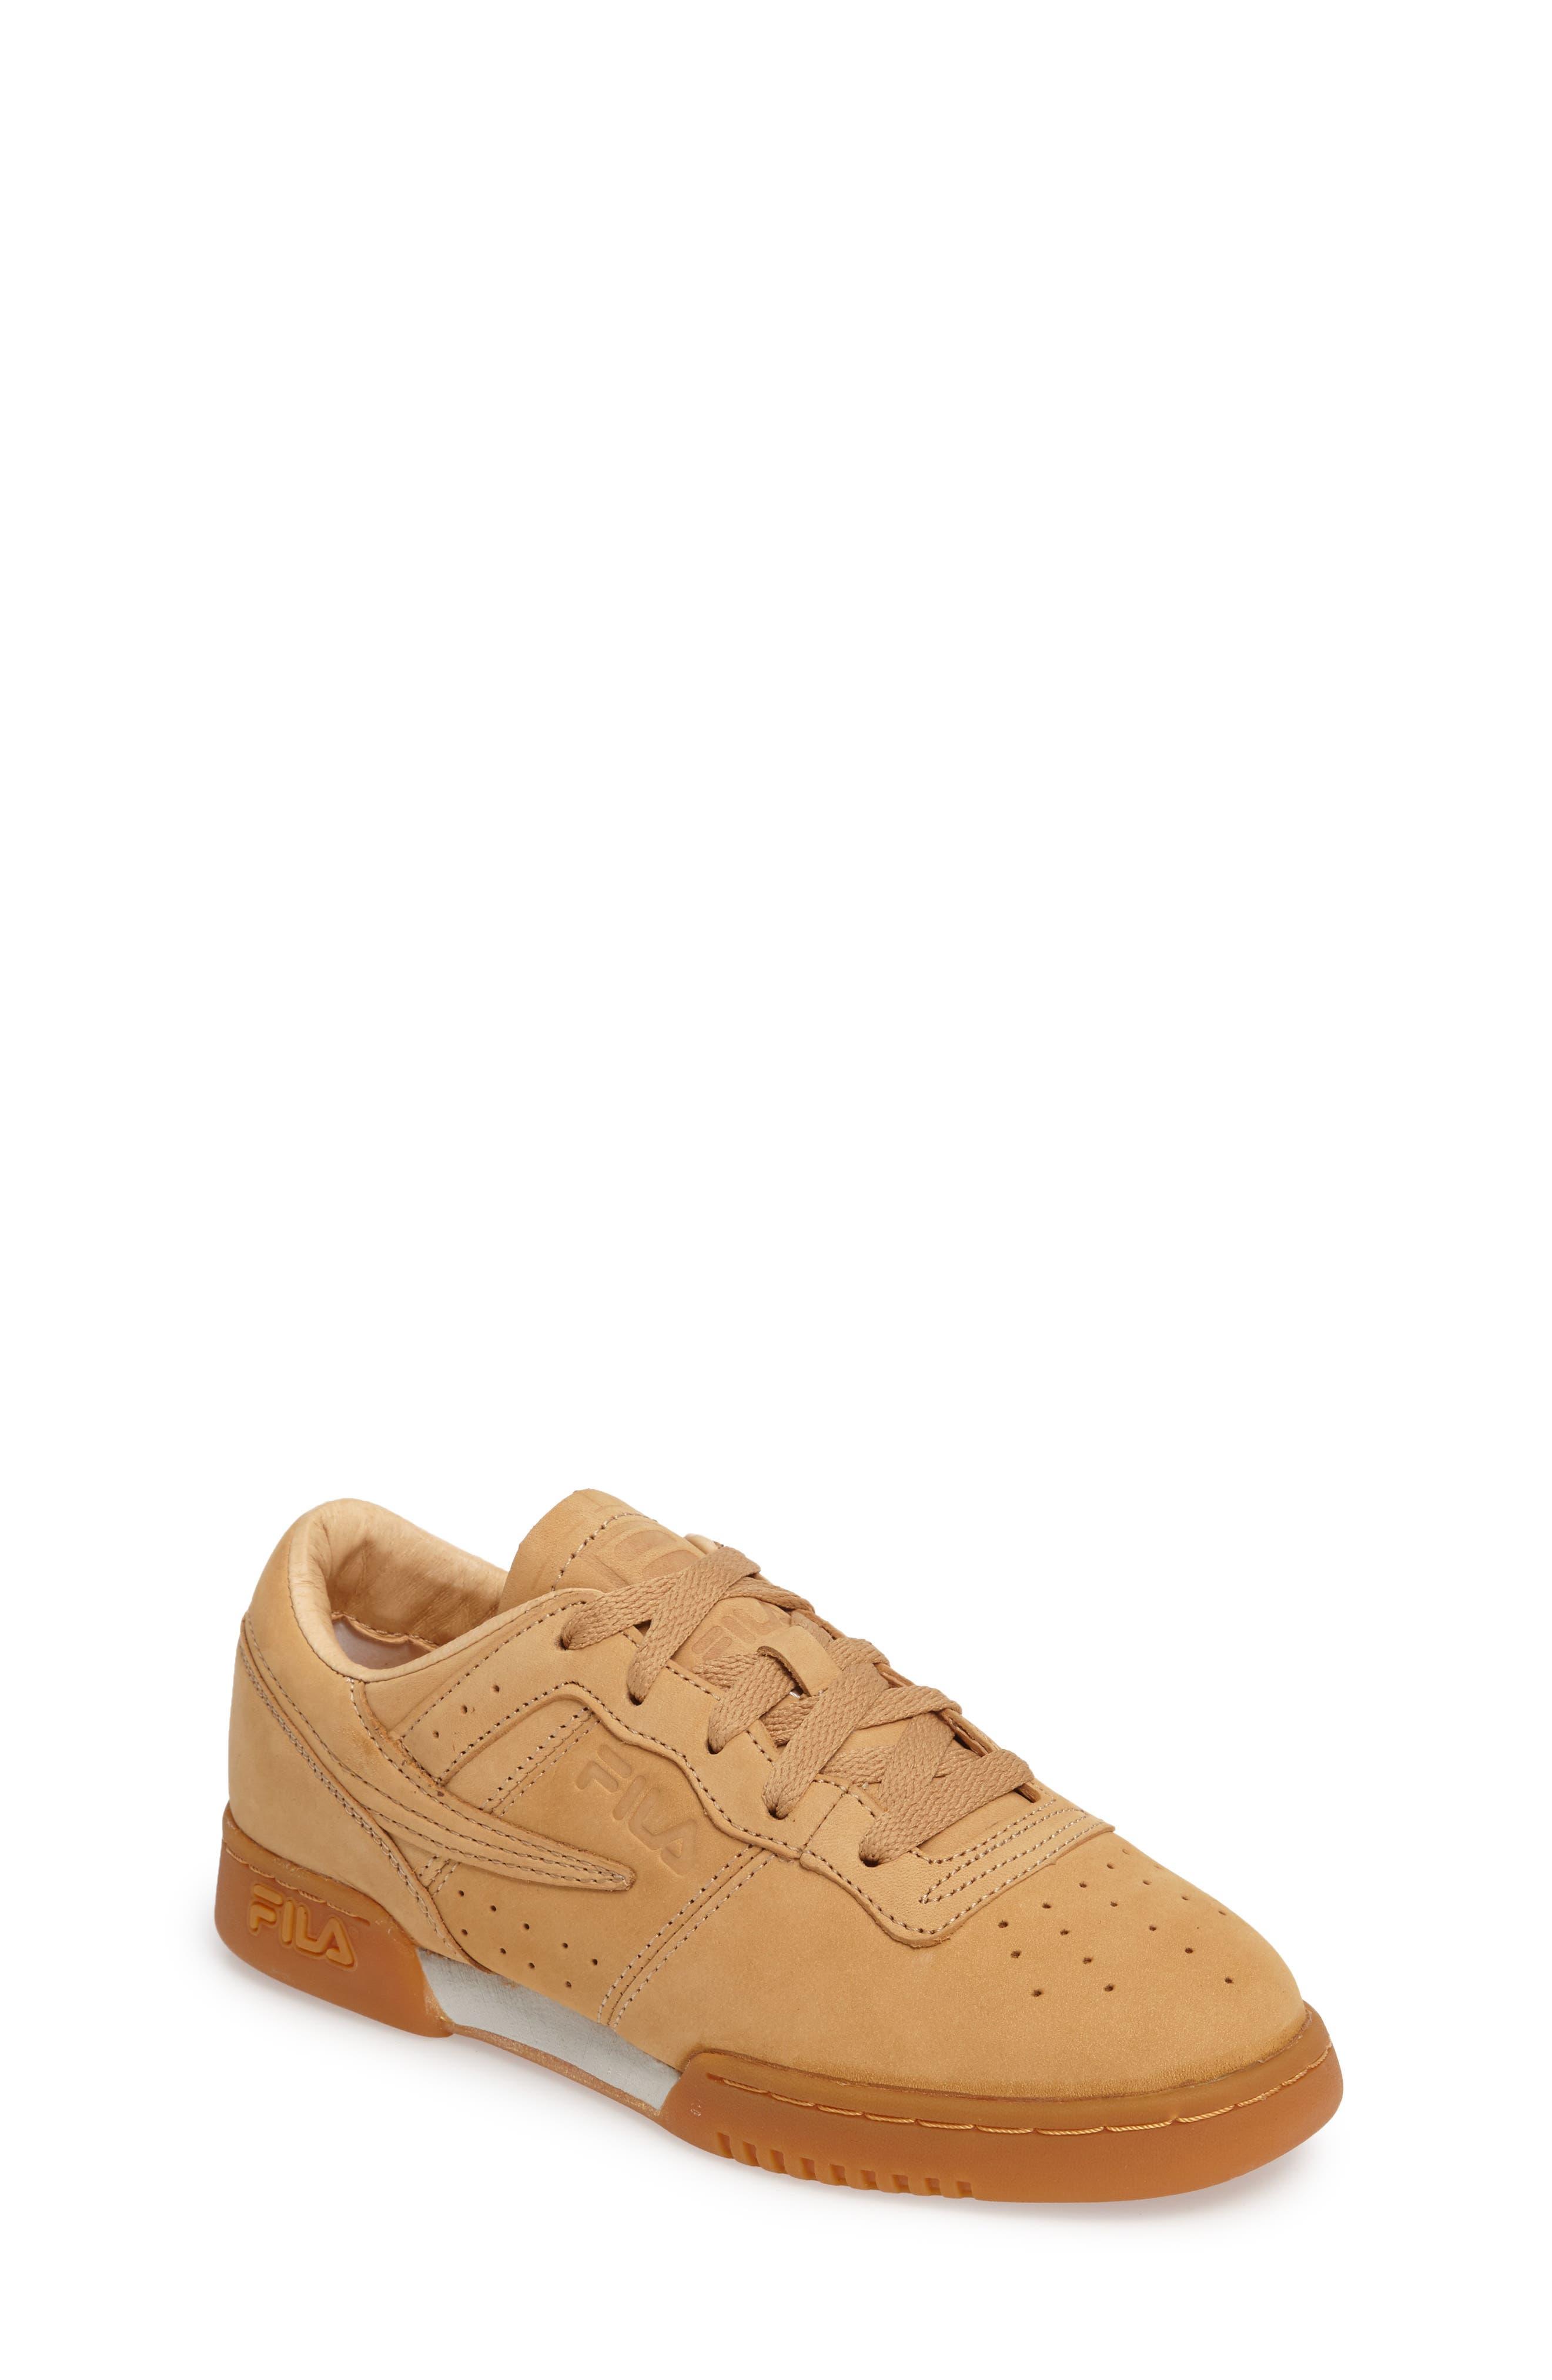 USA Heritage Sneaker,                             Alternate thumbnail 2, color,